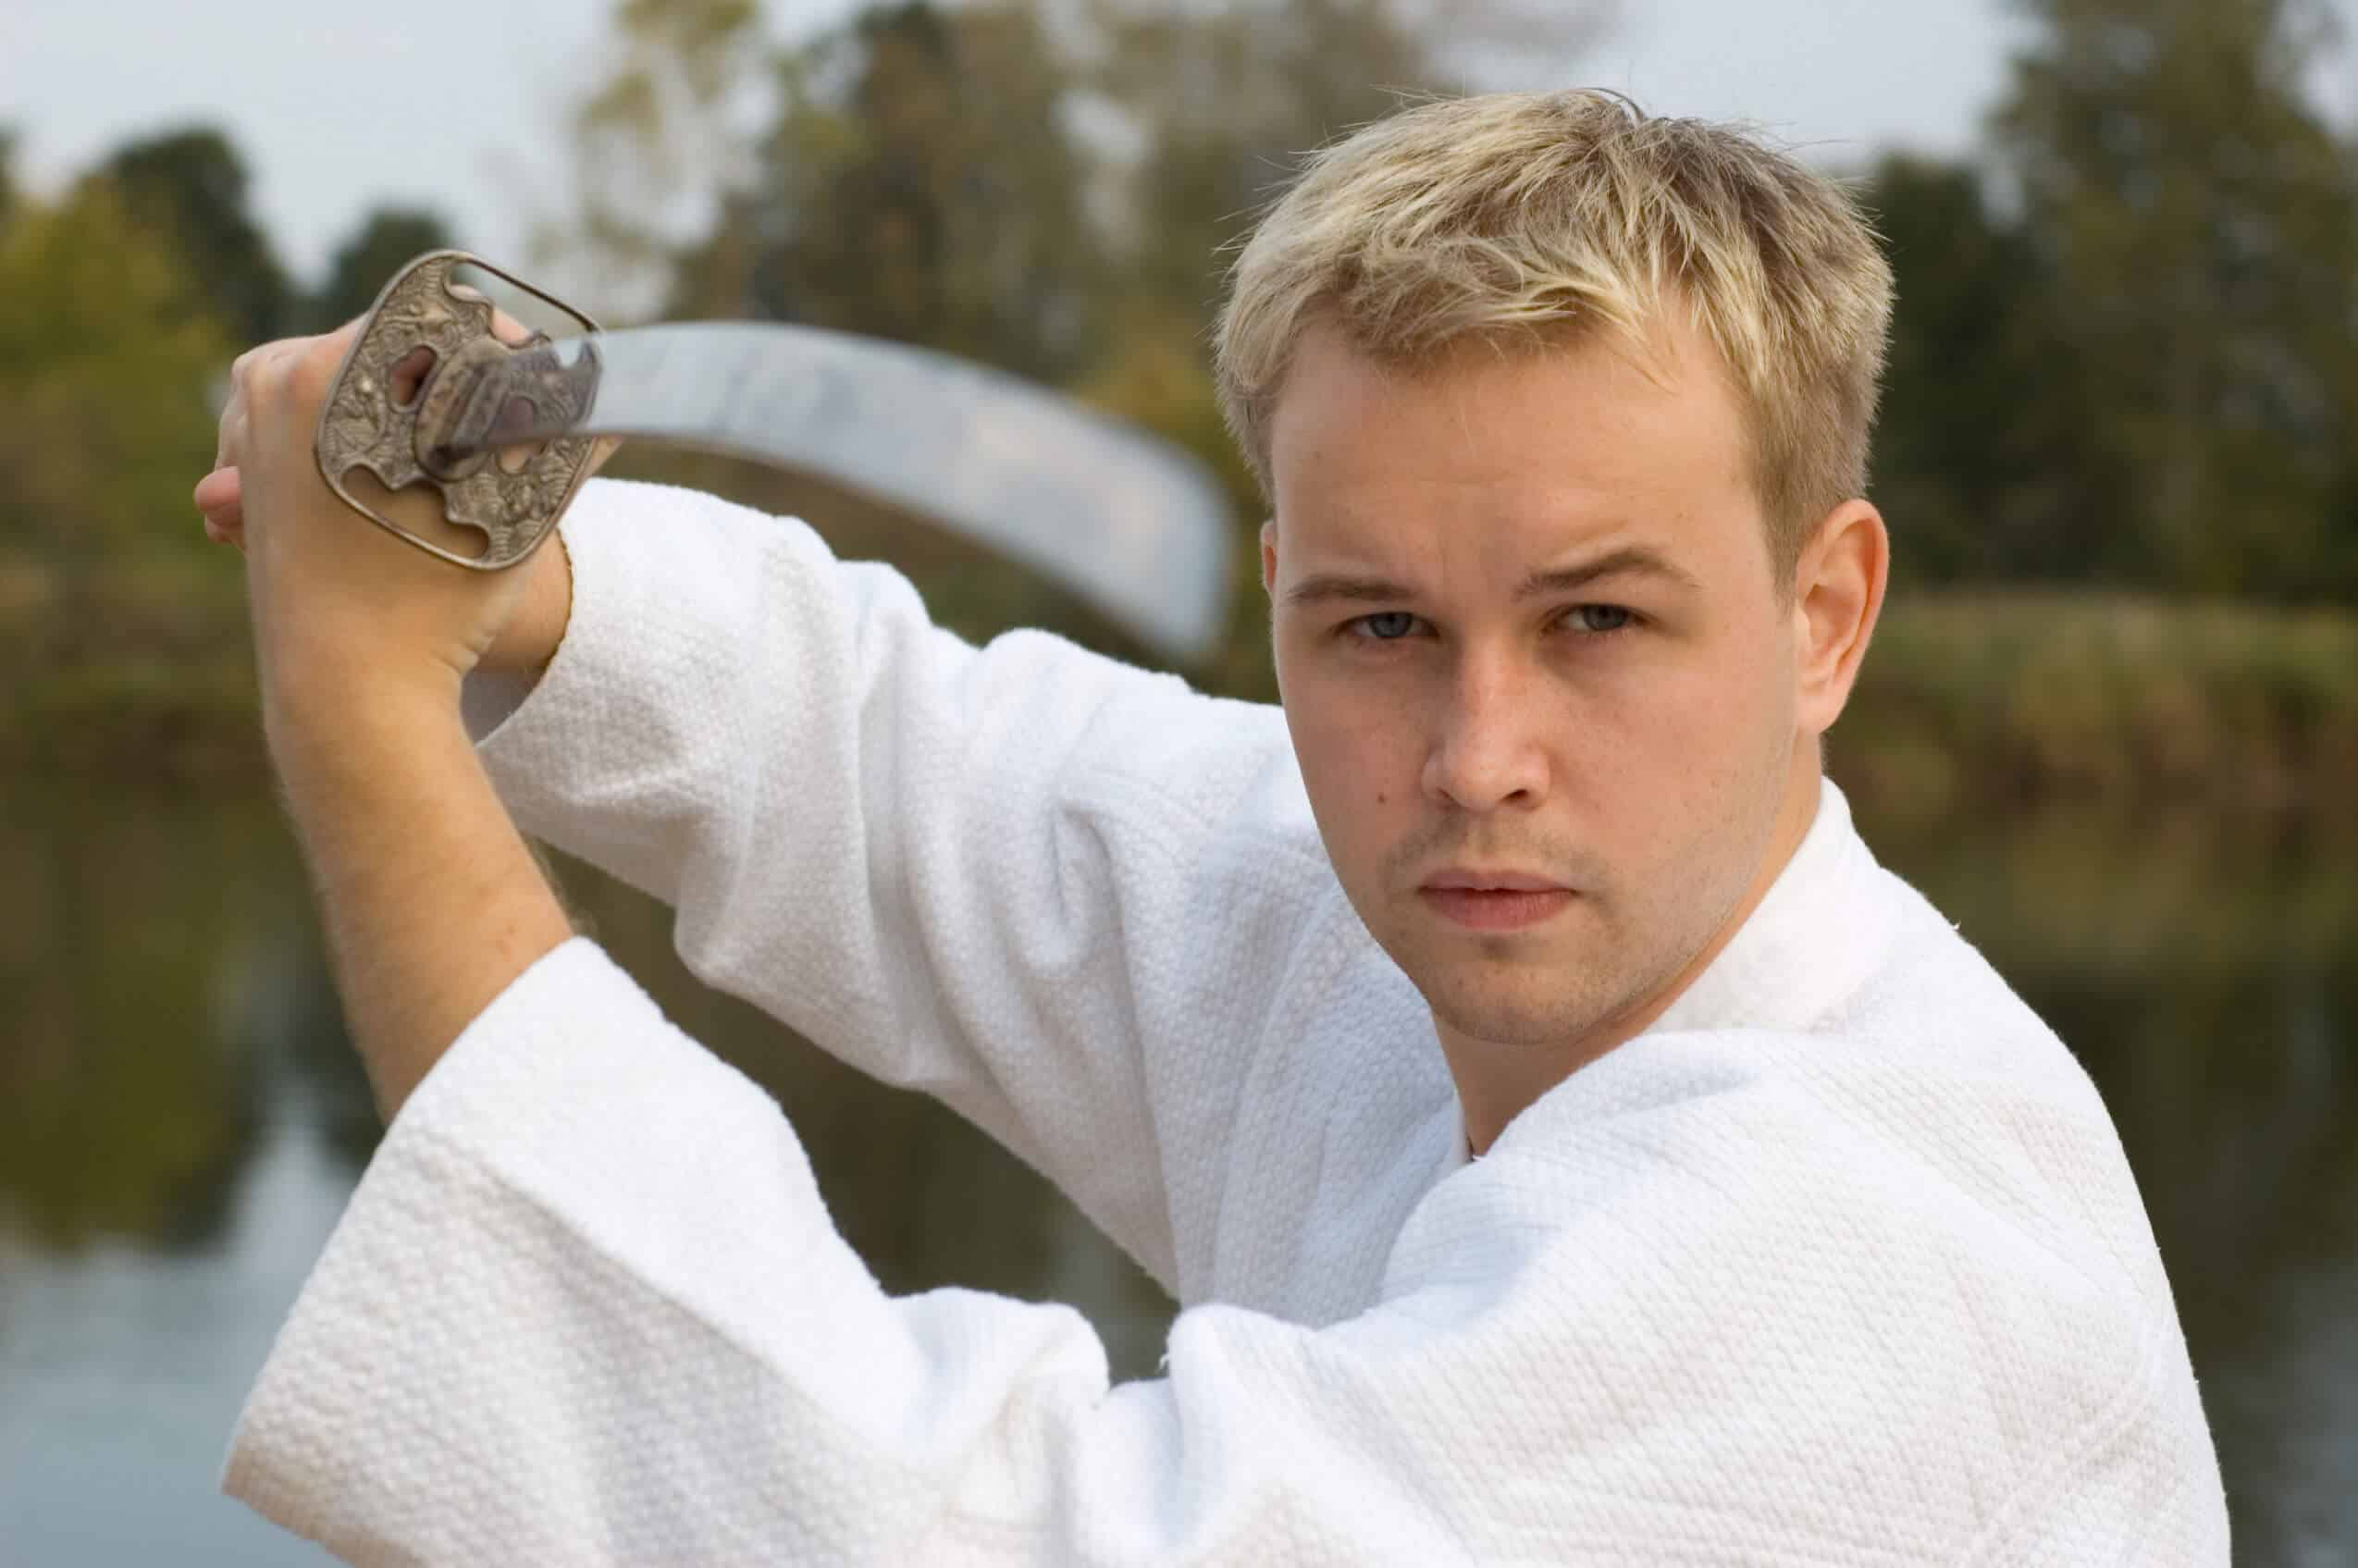 Martial Arts Lessons for Adults in _Naugatuck_ CT - Samurai Sword Posing Blog